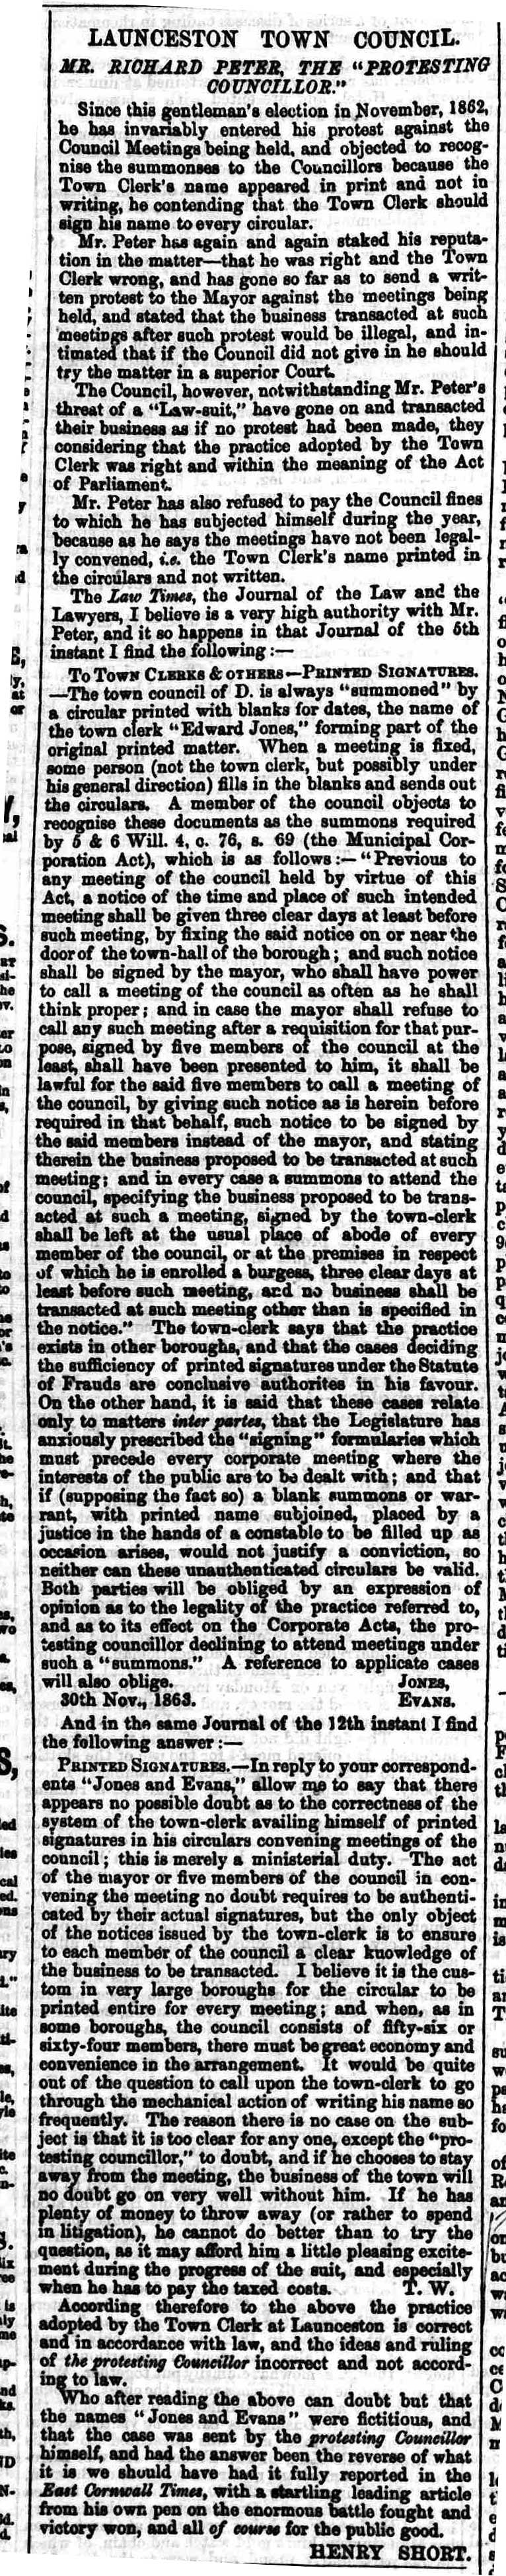 19 December 1863